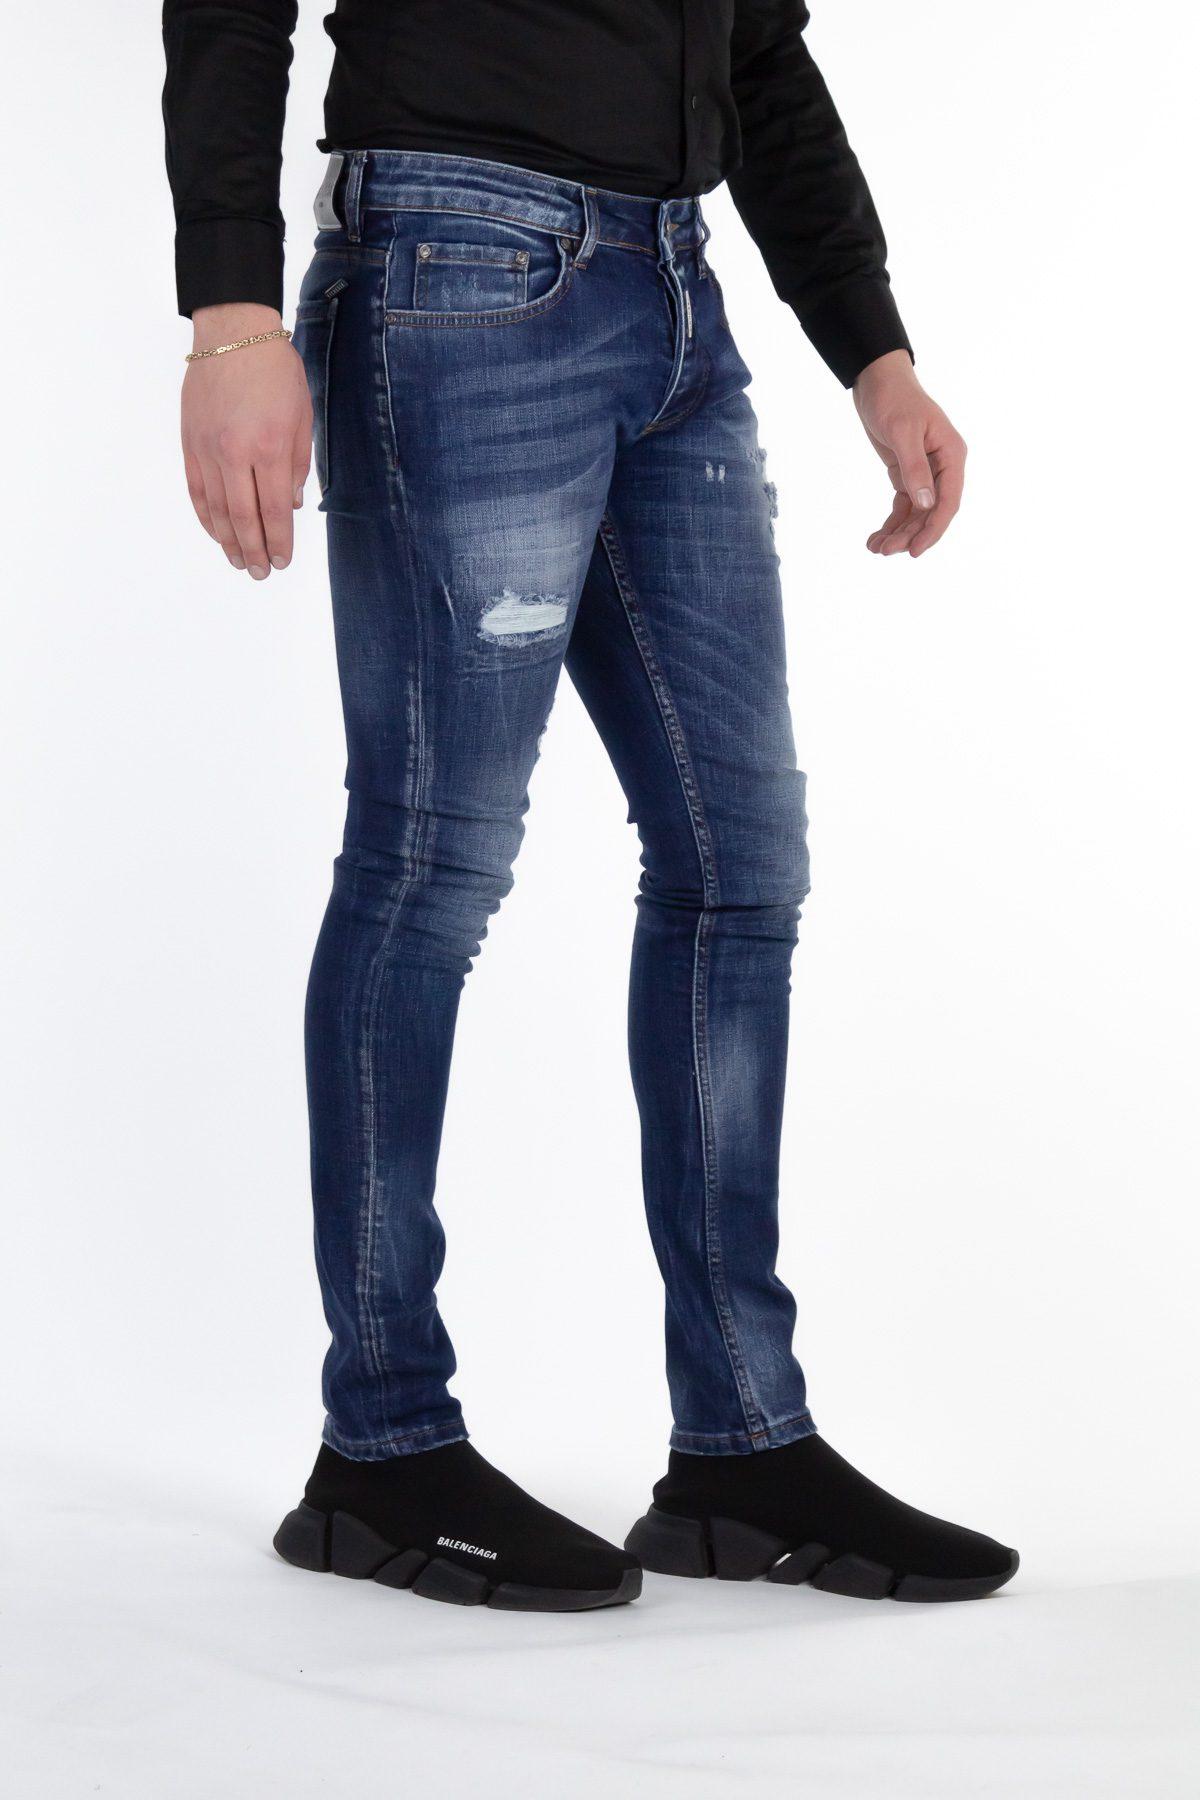 Richesse Charleroi Blue Jeans 2240-3